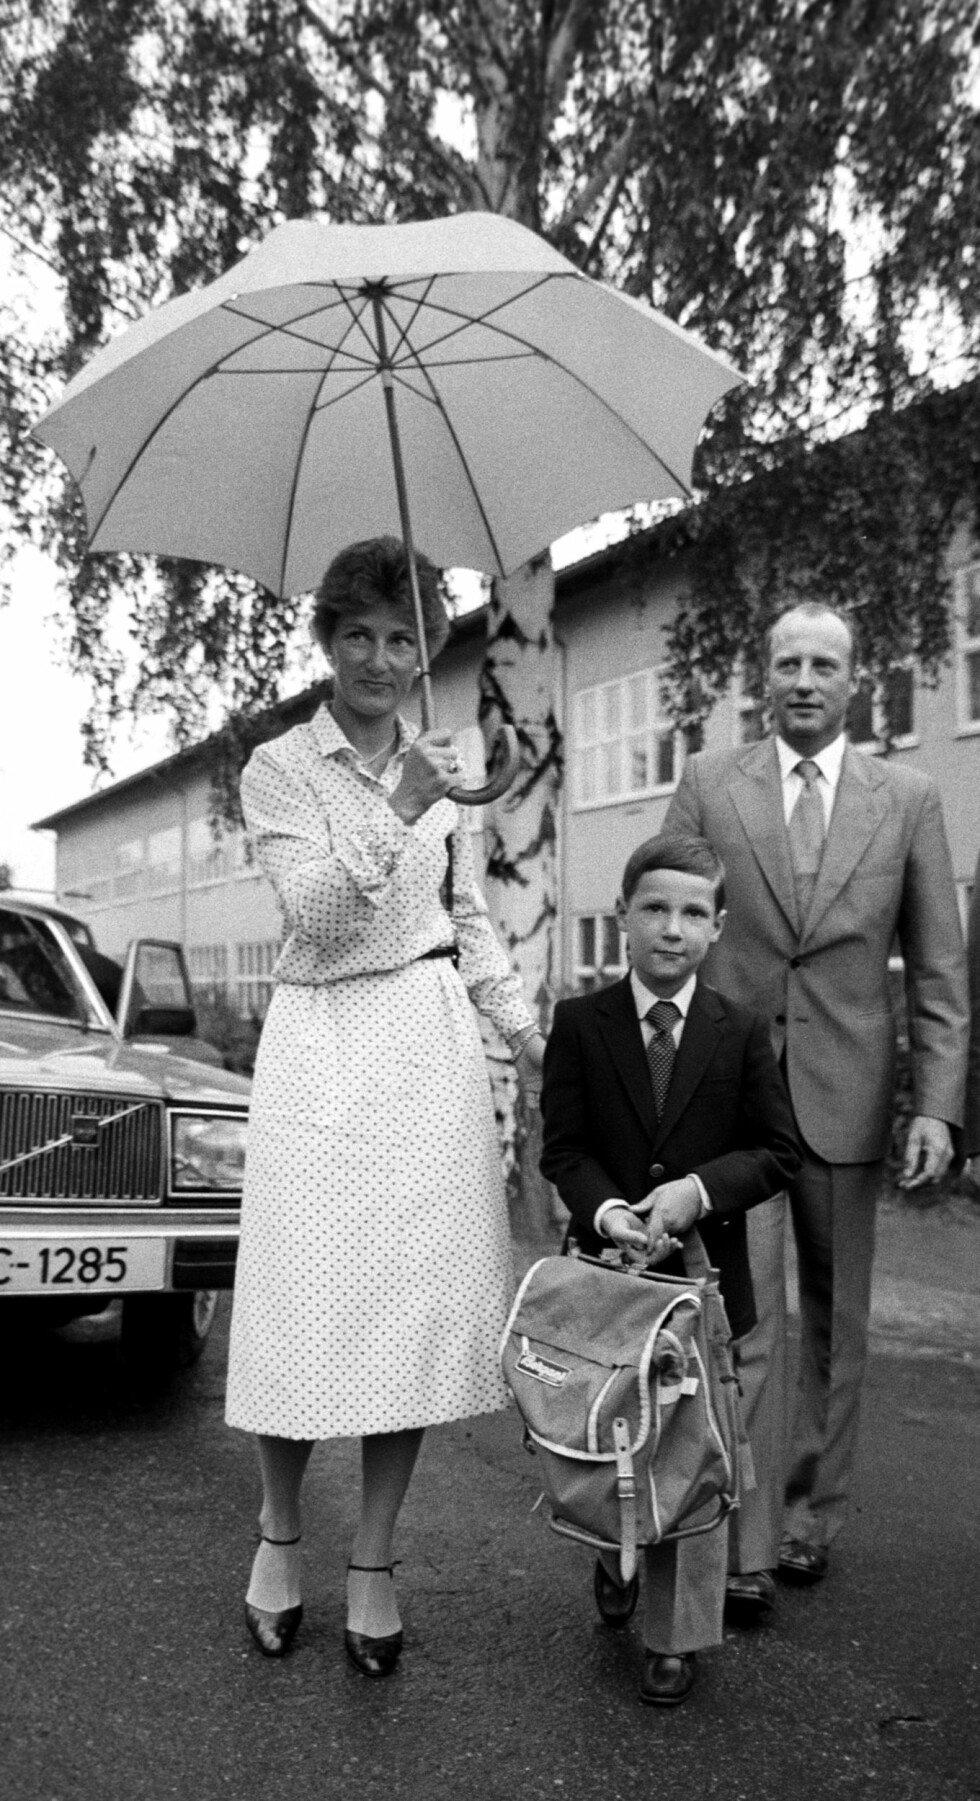 FØRSTE SKOLEDAG: Prins Haakon Magnus ble også fulgt av foreldrene da han begynte på Smestad skole i august 1980. Foto:  Foto: NTB Scanpix